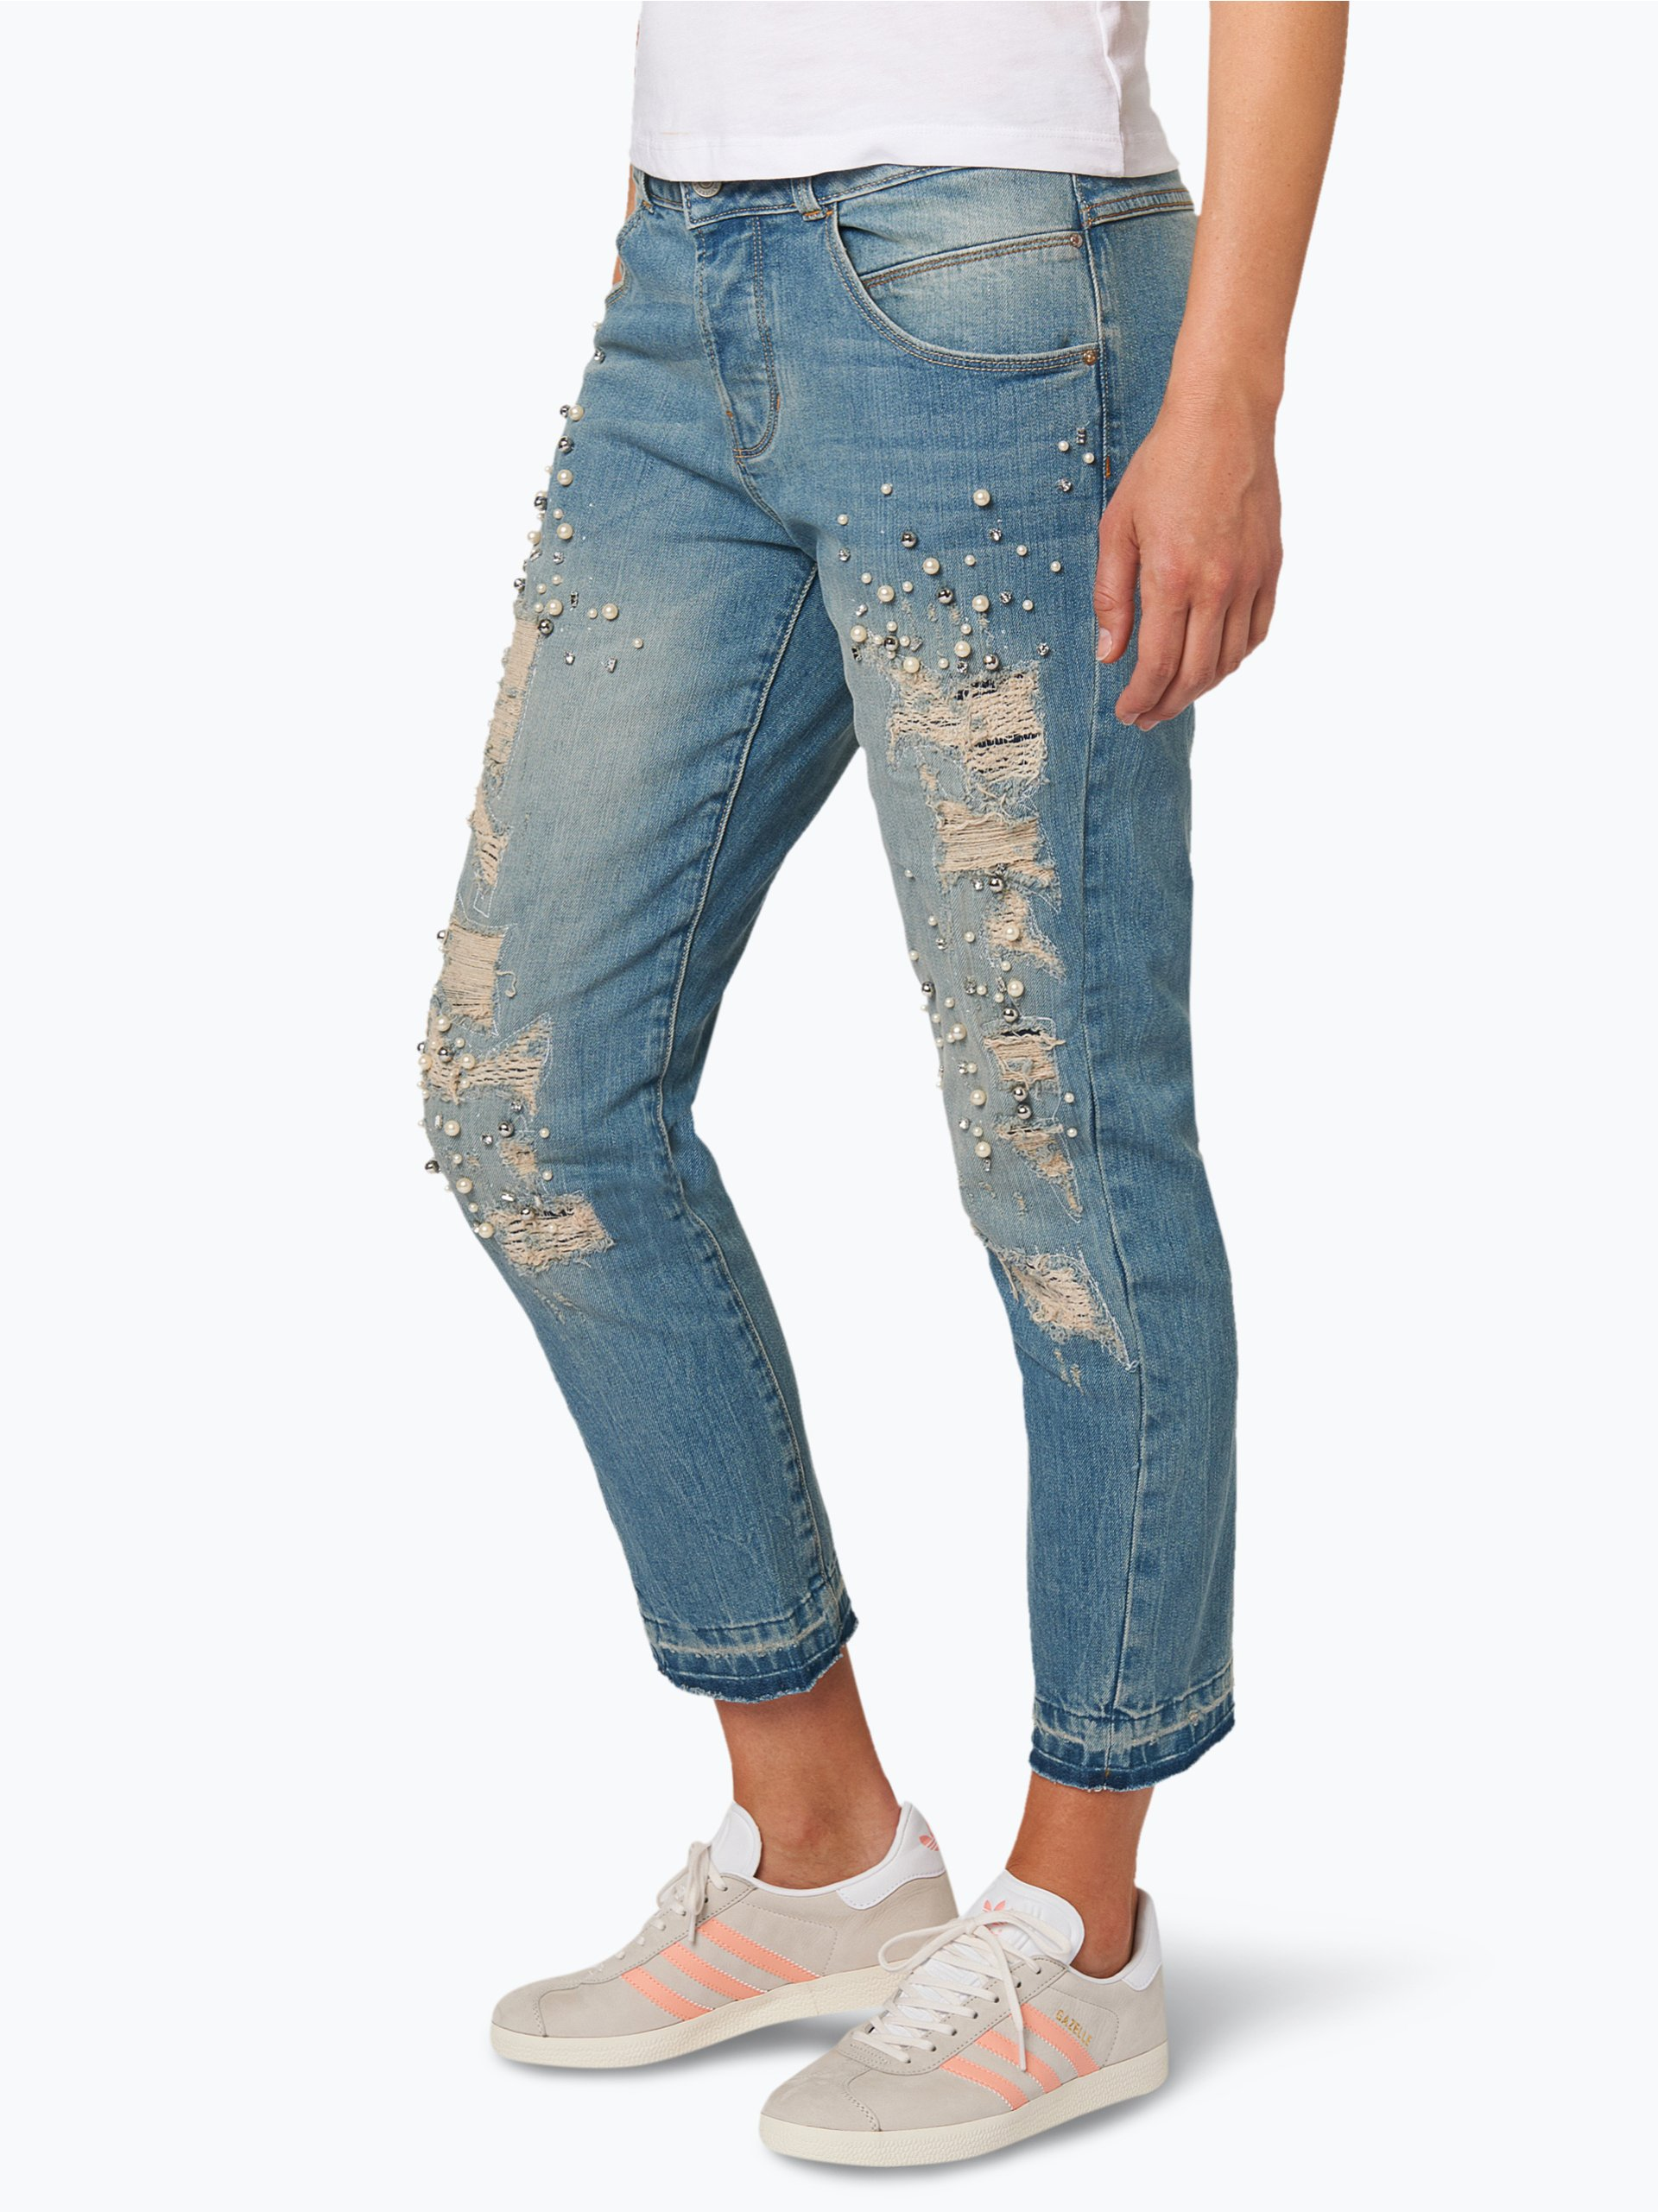 guess jeans damen jeans ragd hellblau uni online kaufen. Black Bedroom Furniture Sets. Home Design Ideas